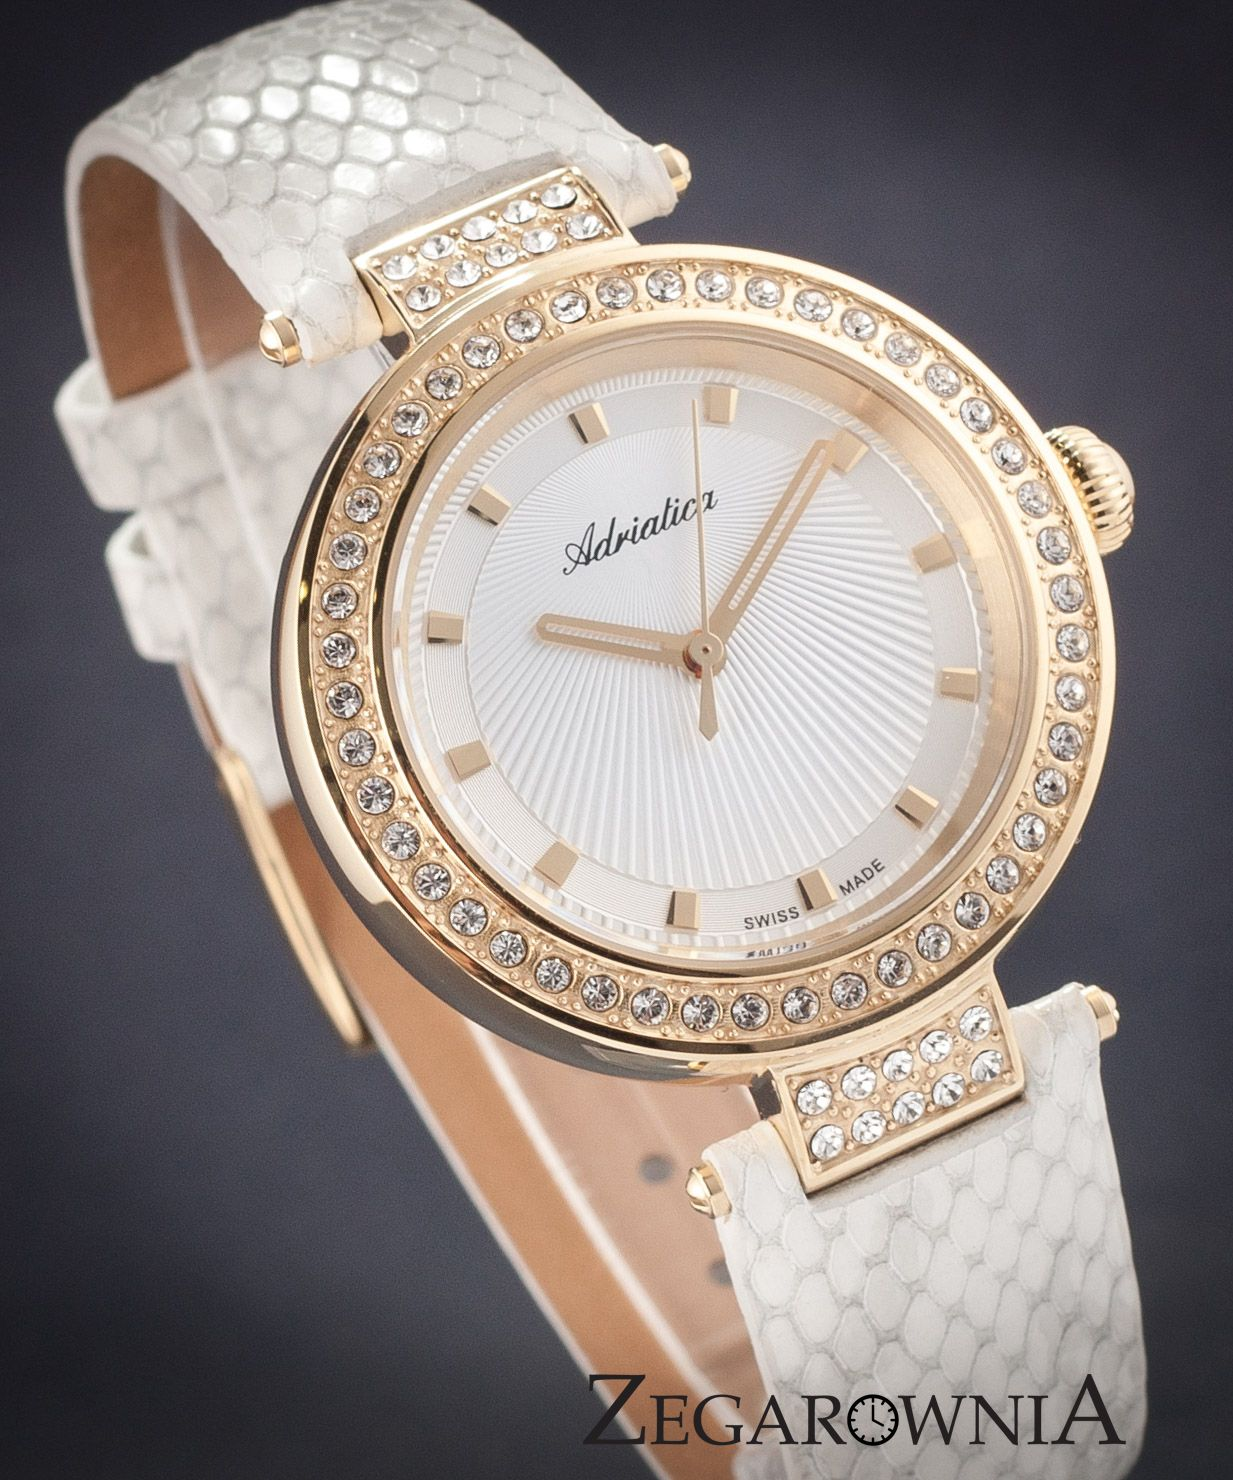 Zegarek Damski Adriatica Classic Http Zegarownia Pl Zegarek Damski Adriatica Classic A3692 1213qz Rolex Watches Womens Fashion Watches